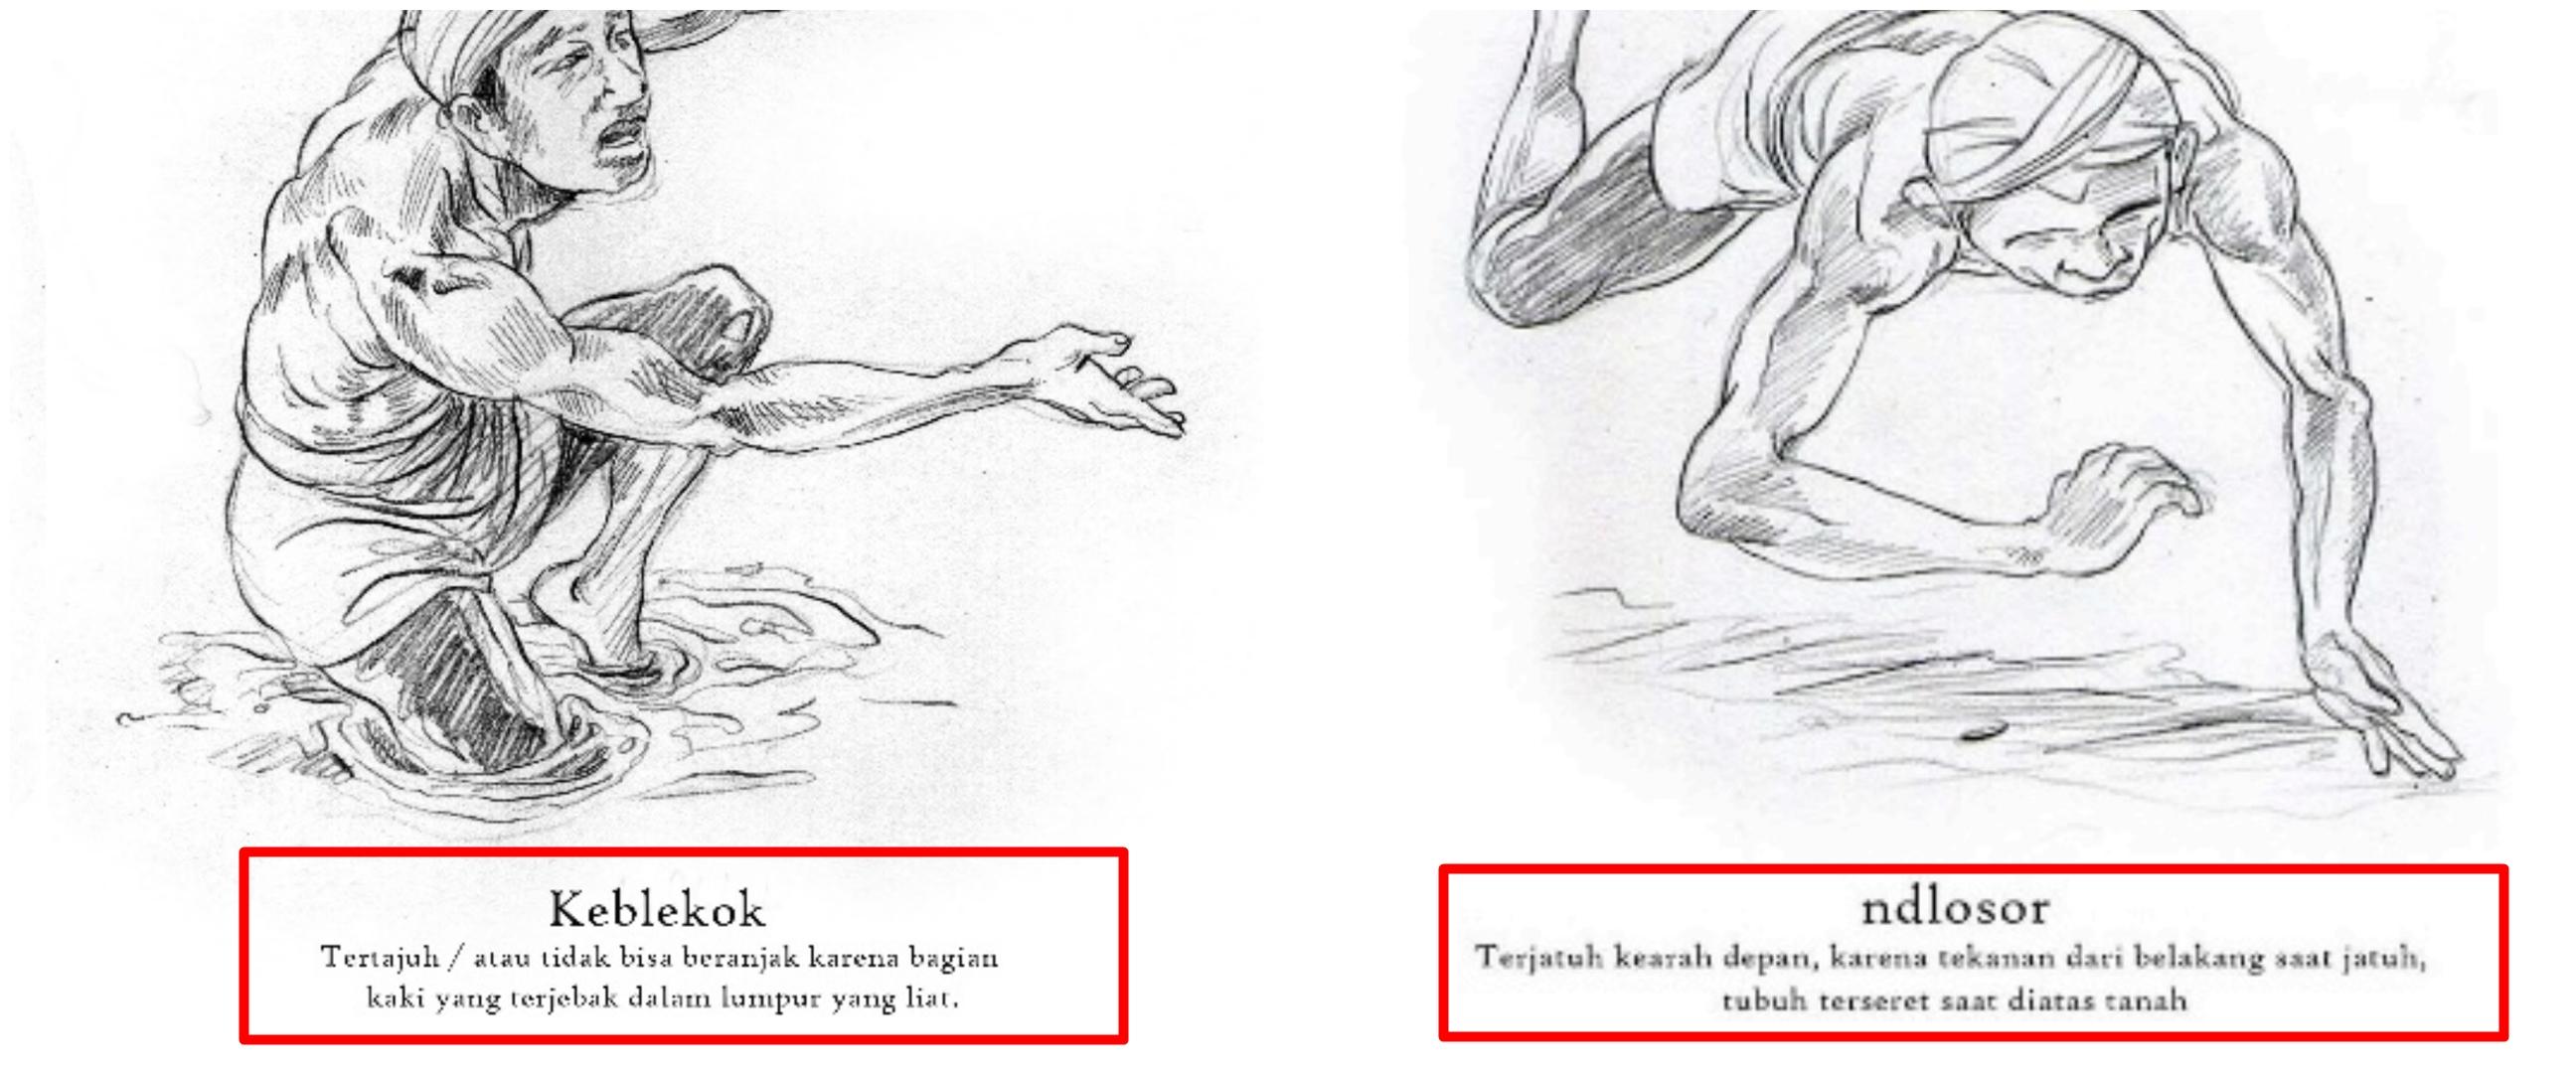 17 Arti 'jatuh' menurut bahasa Jawa, detailnya ngalahin bahasa Inggris